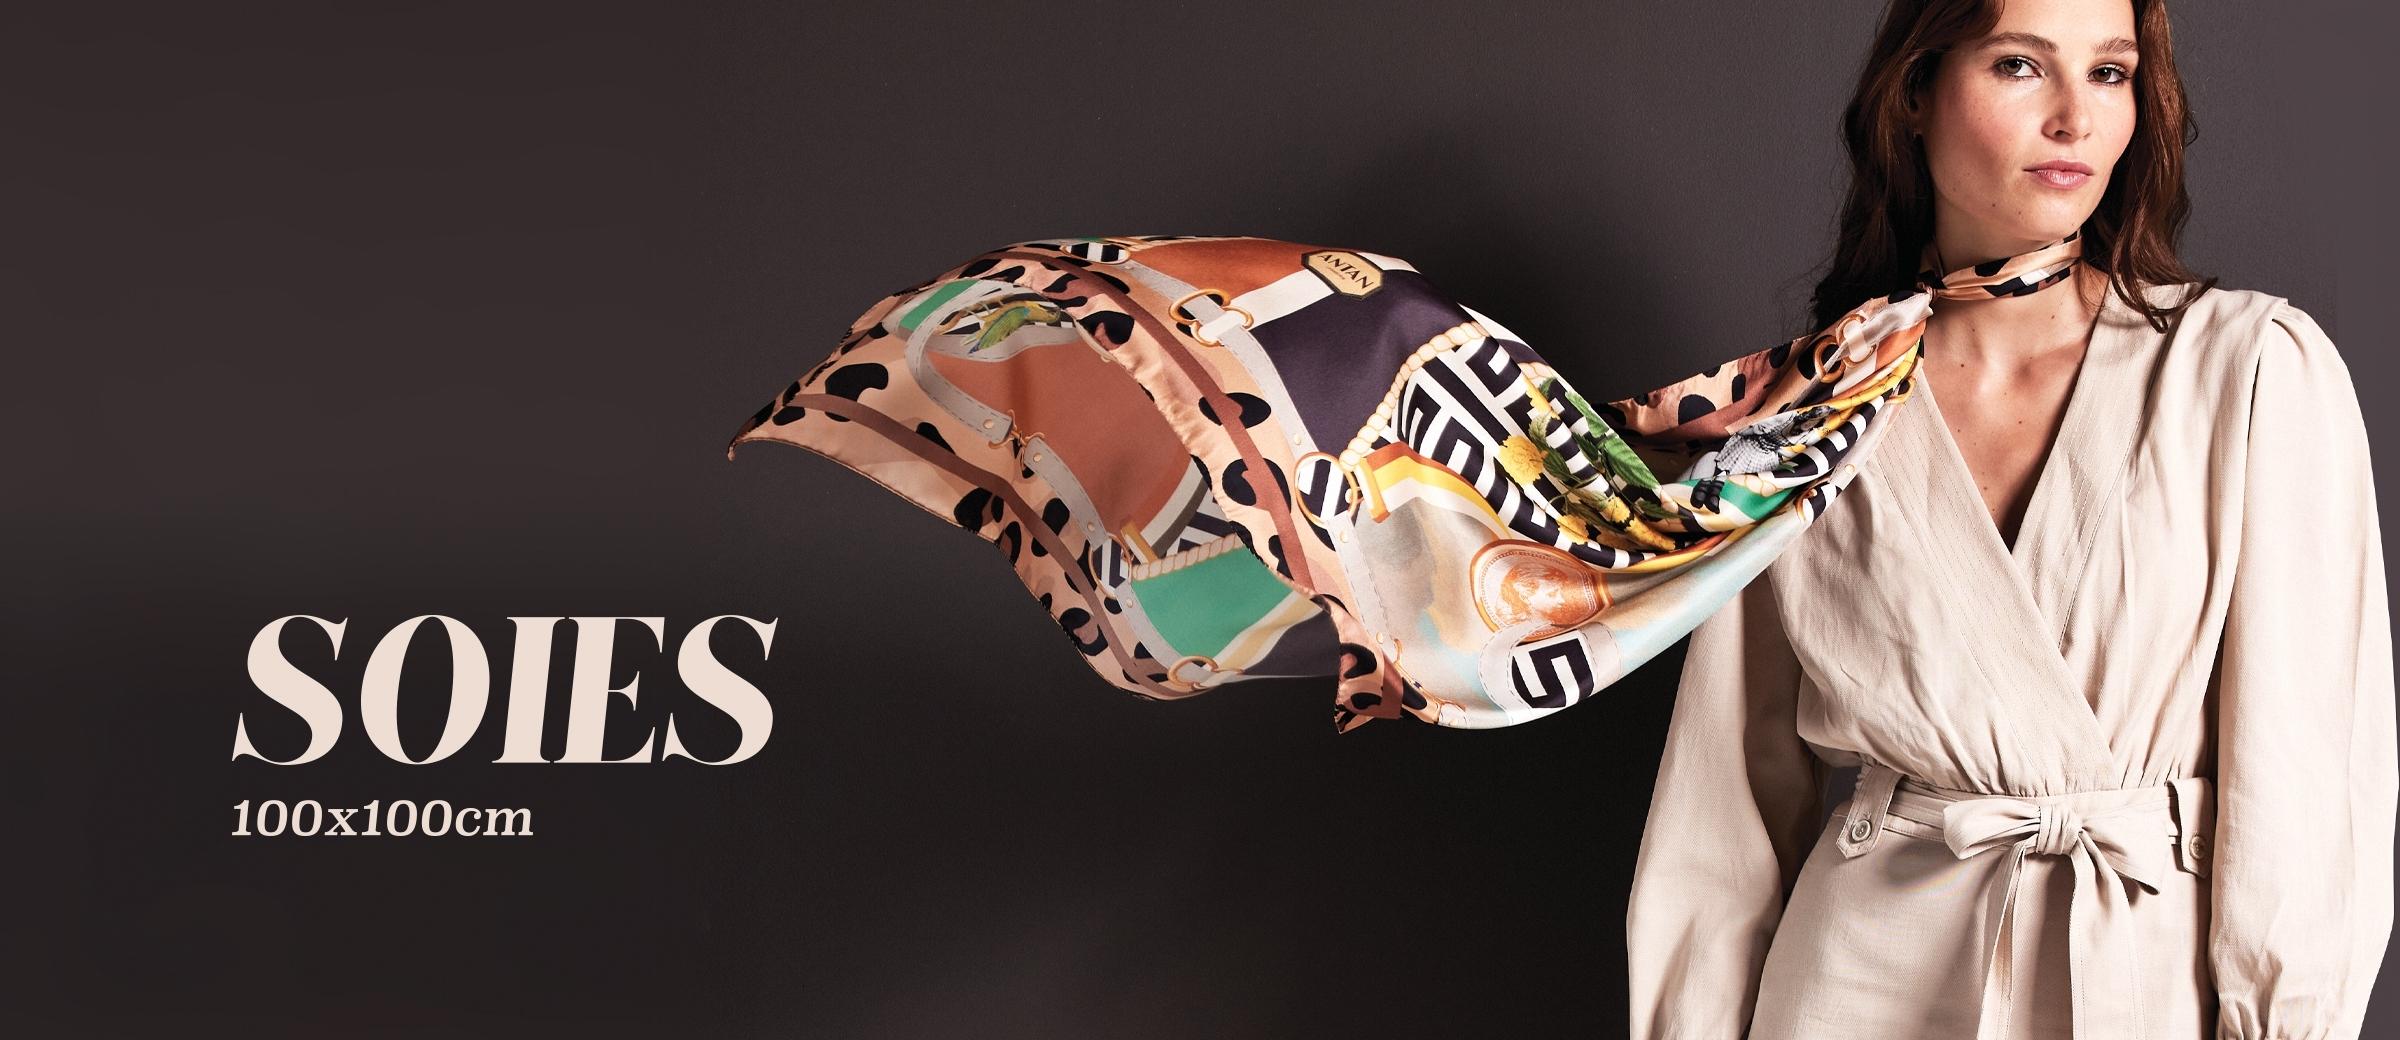 Foulards soie 100x100cm